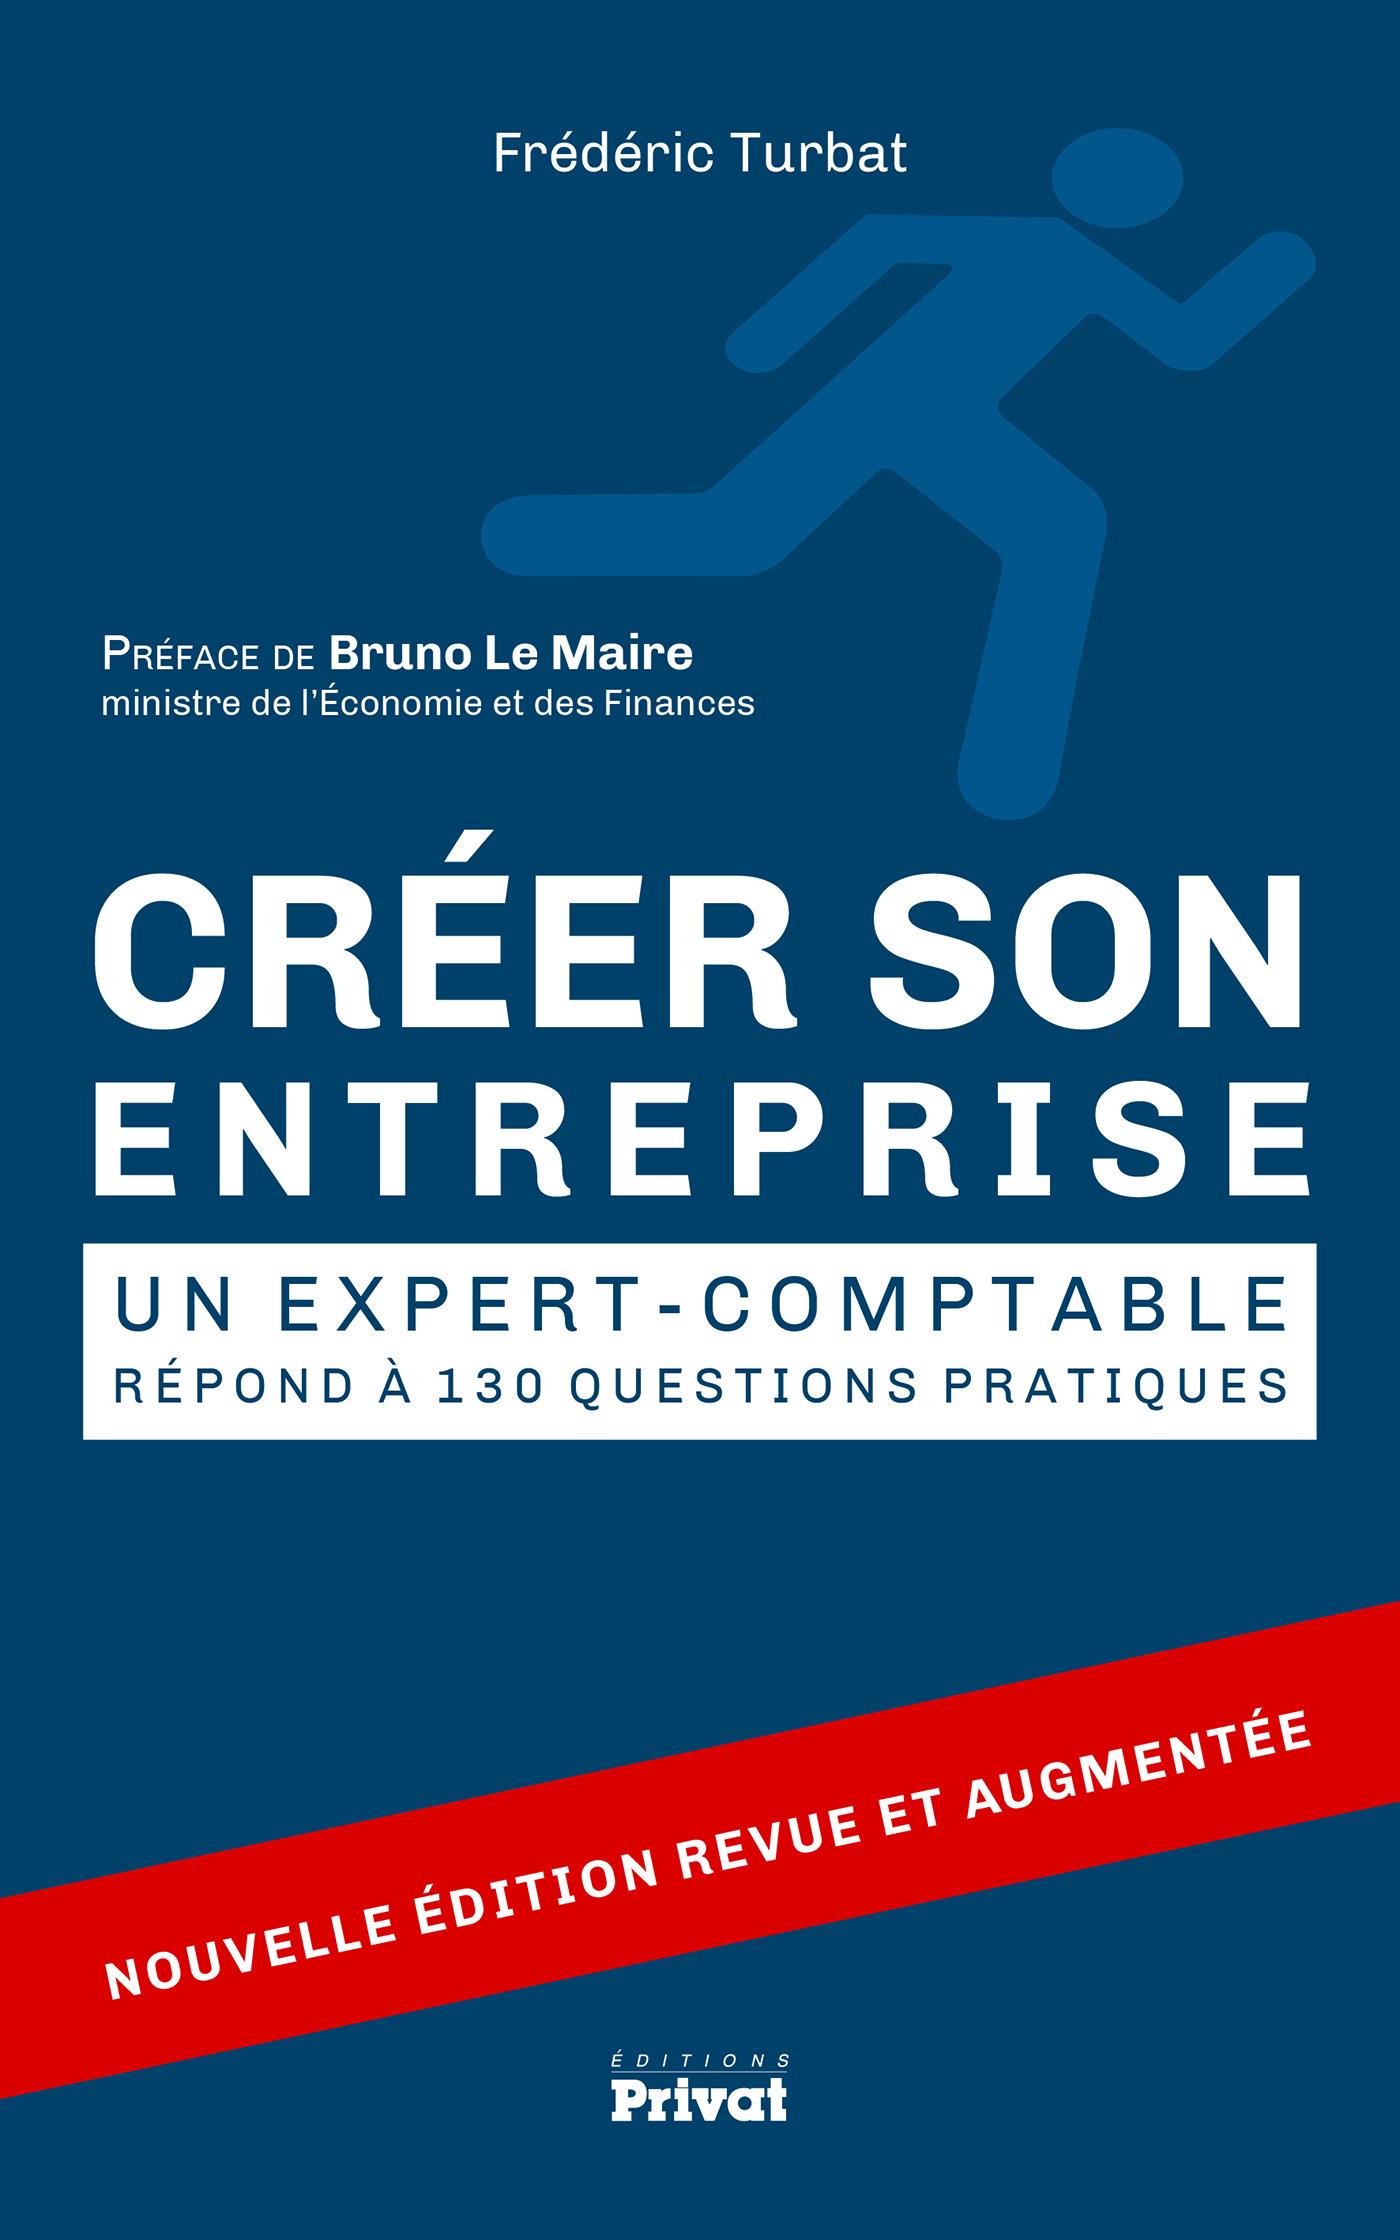 CREER SON ENTREPRISE - UN EXPERT-COMPTABLE REPOND A 130 QUESTIONS